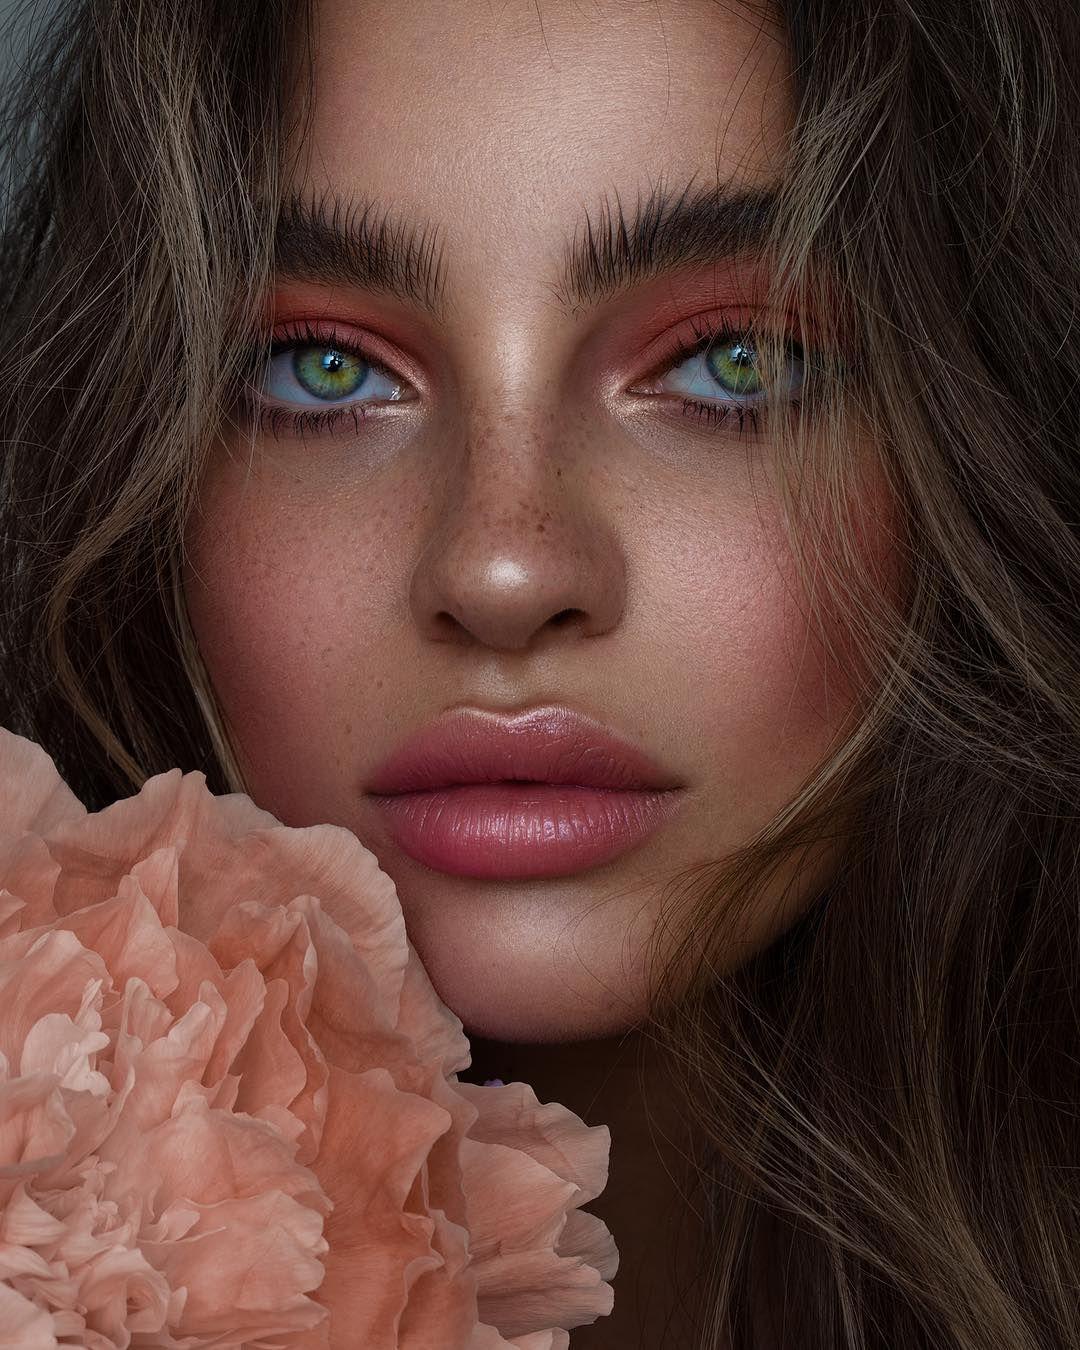 "Photo of Nikki_Makeup on Instagram: ""Wishing you all a peachy 2019 🥂🎉💃💘💫 @giulianaxgg shot by @ tamarawilliams1 #nikki_makeup"""